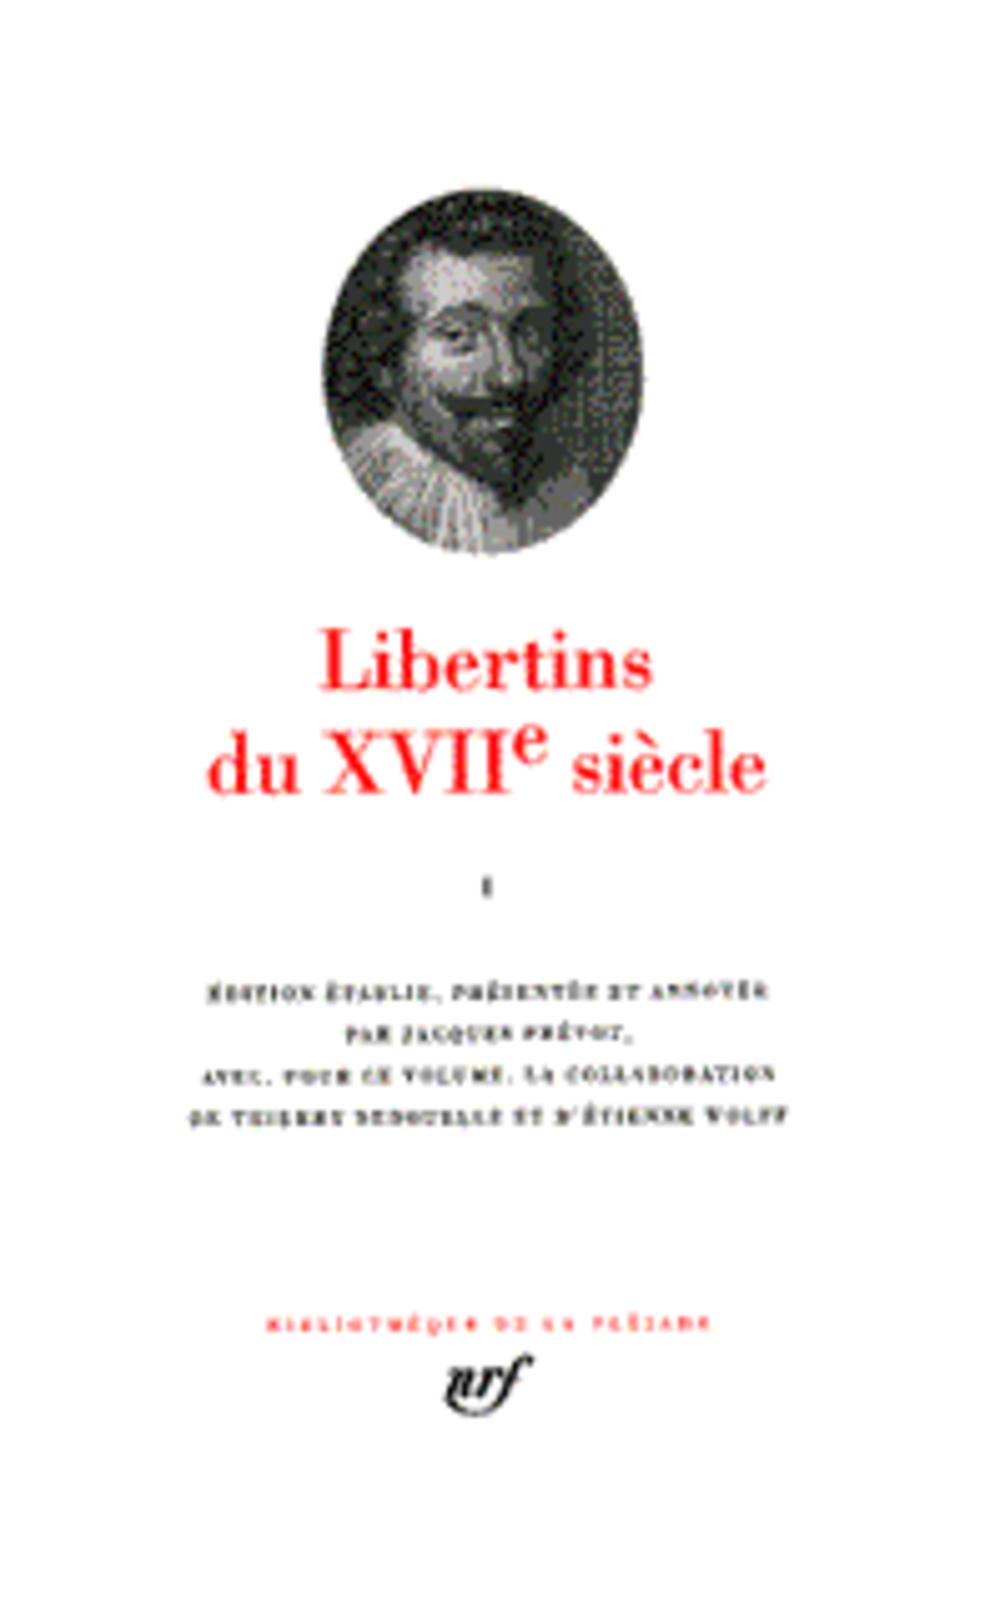 COLLECTIF - LIBERTINS DU XVIIE SIECLE T.2